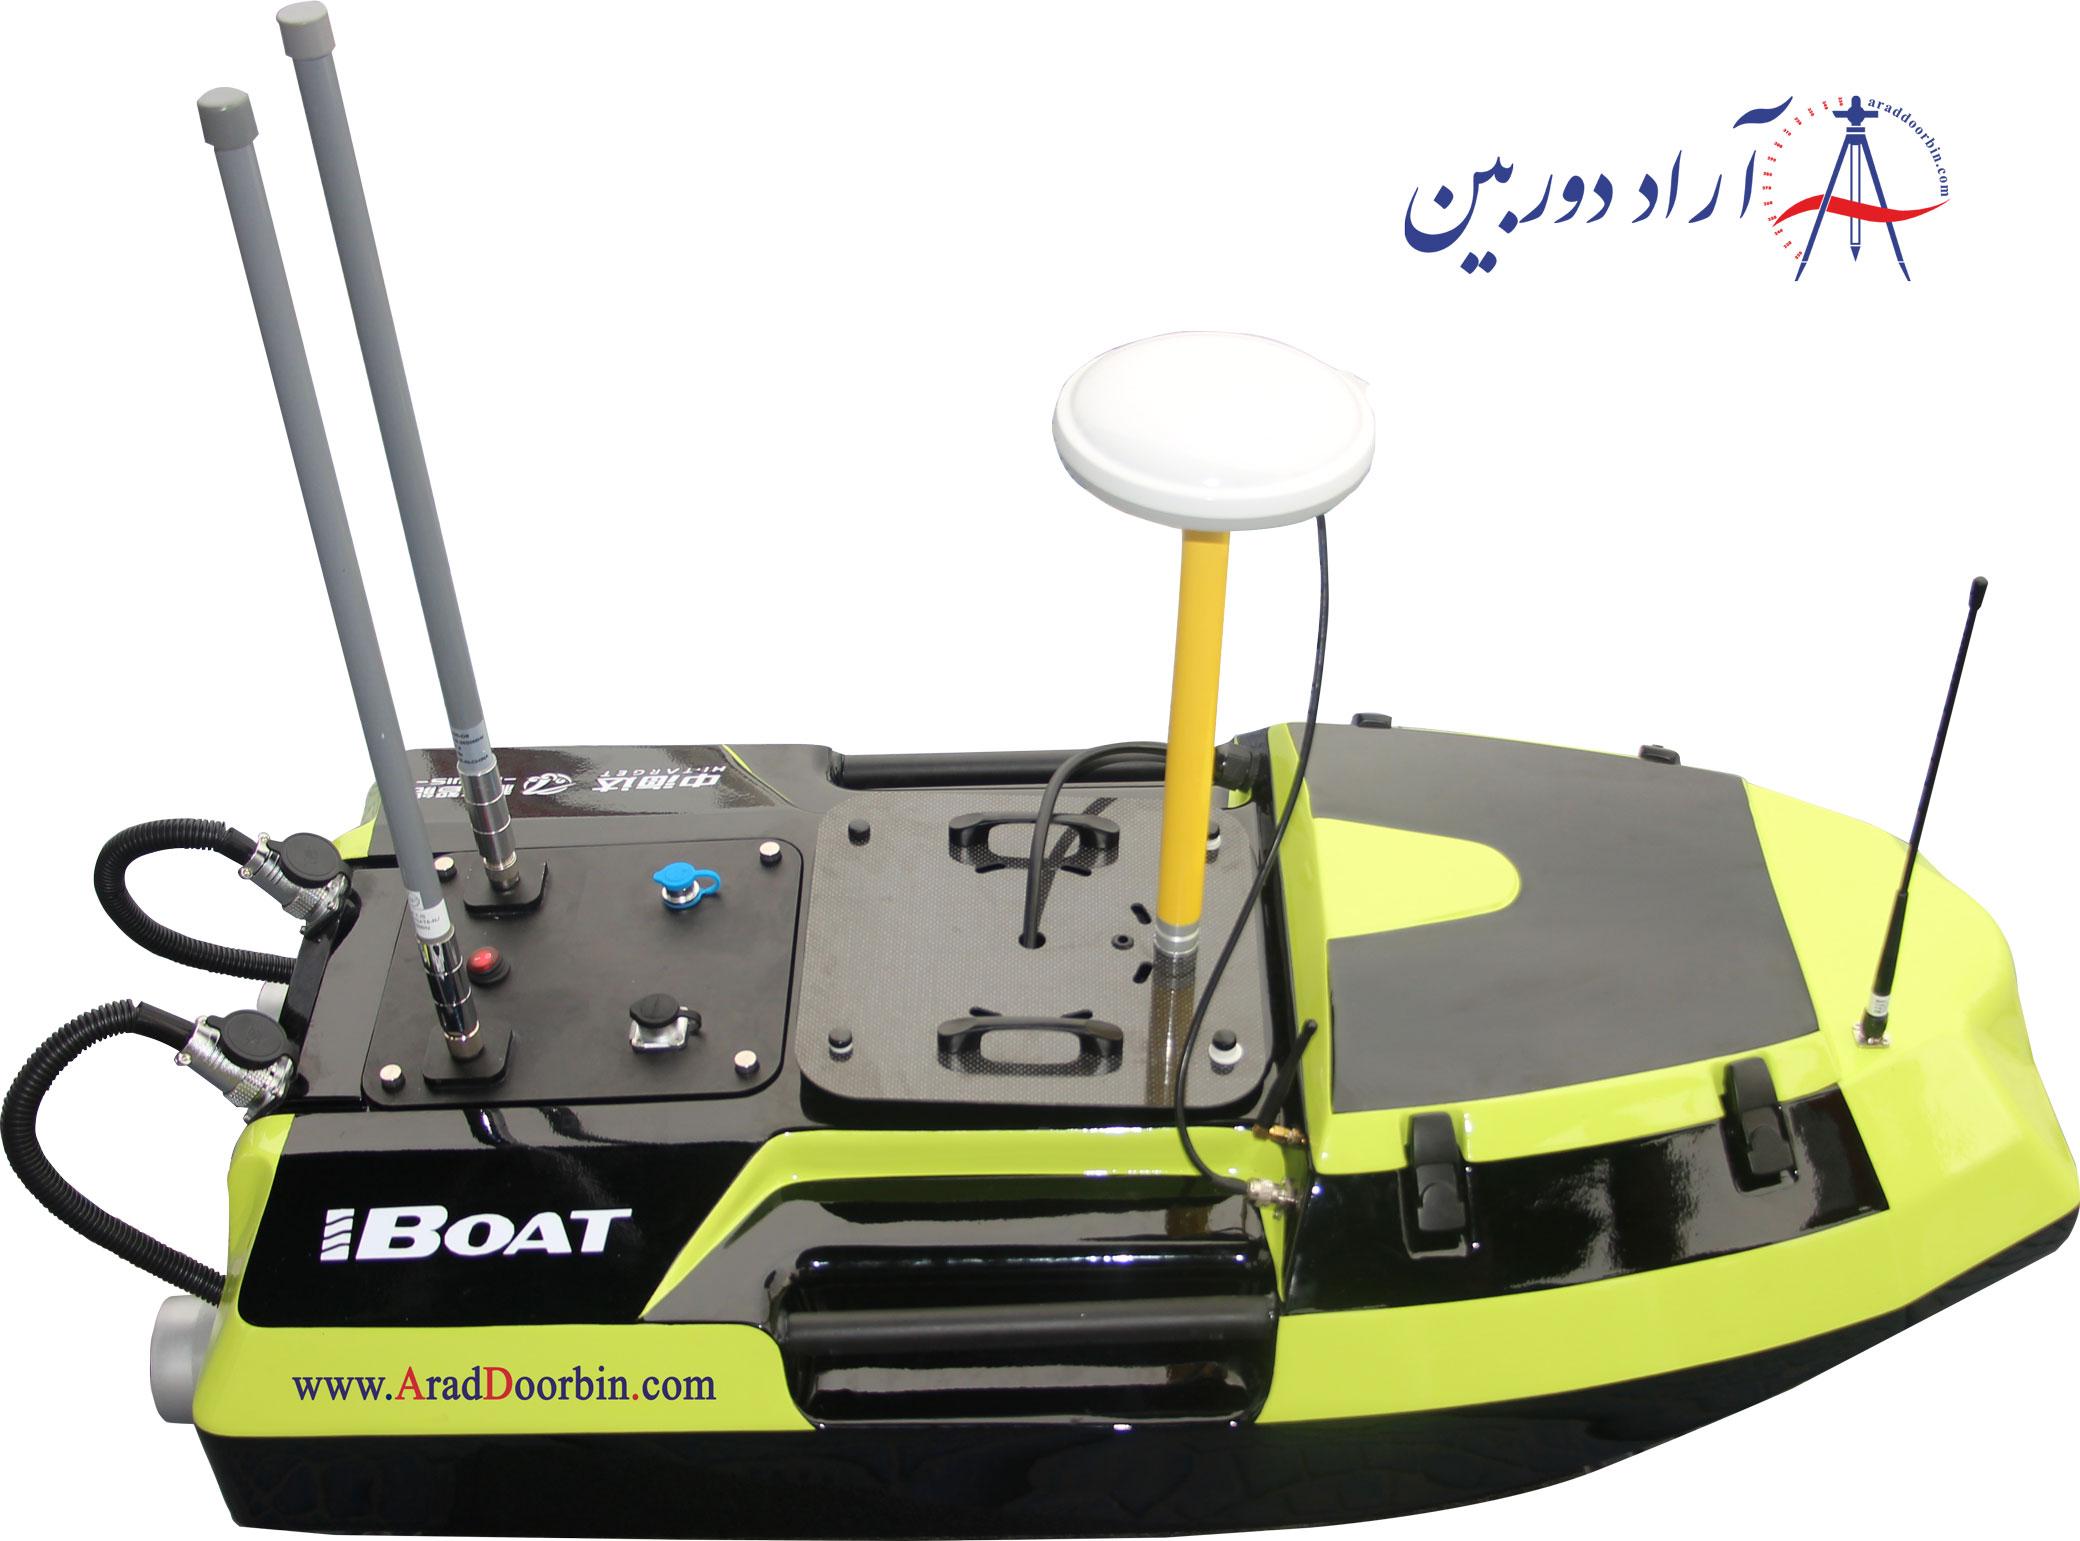 قایق هیدروگرافی Hi-Target BS2